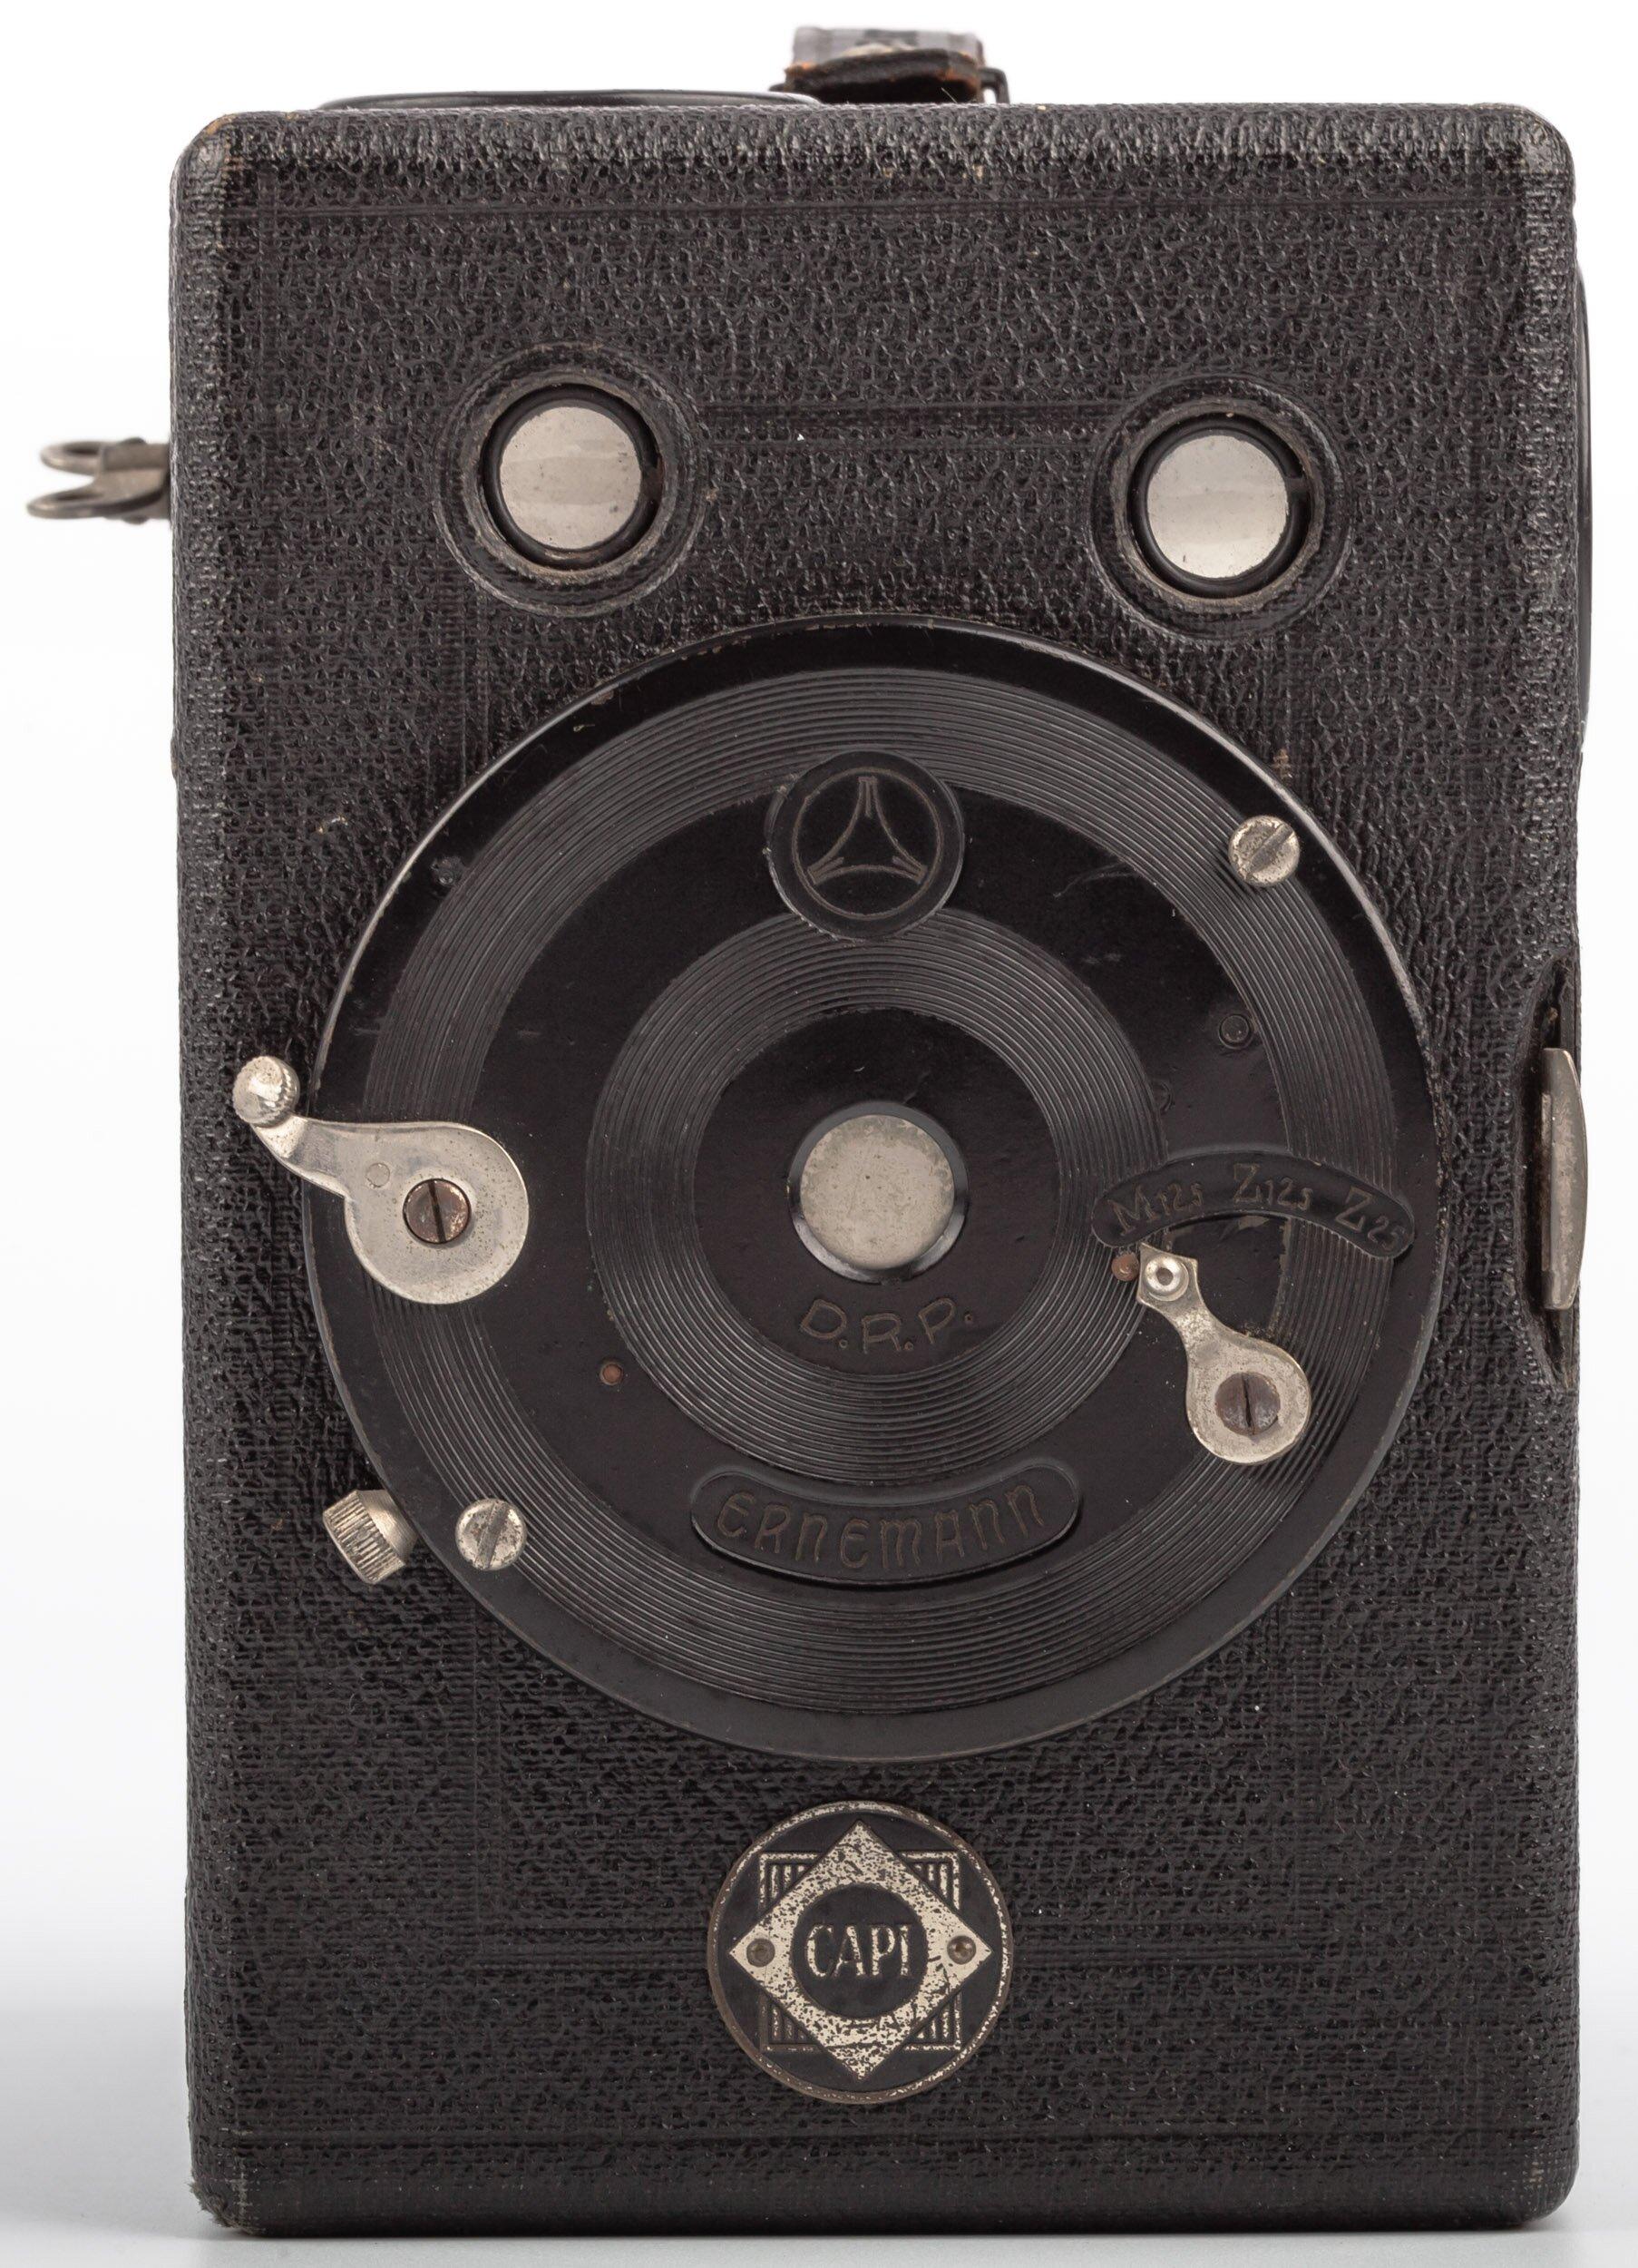 Ernemann 6x9cm Box